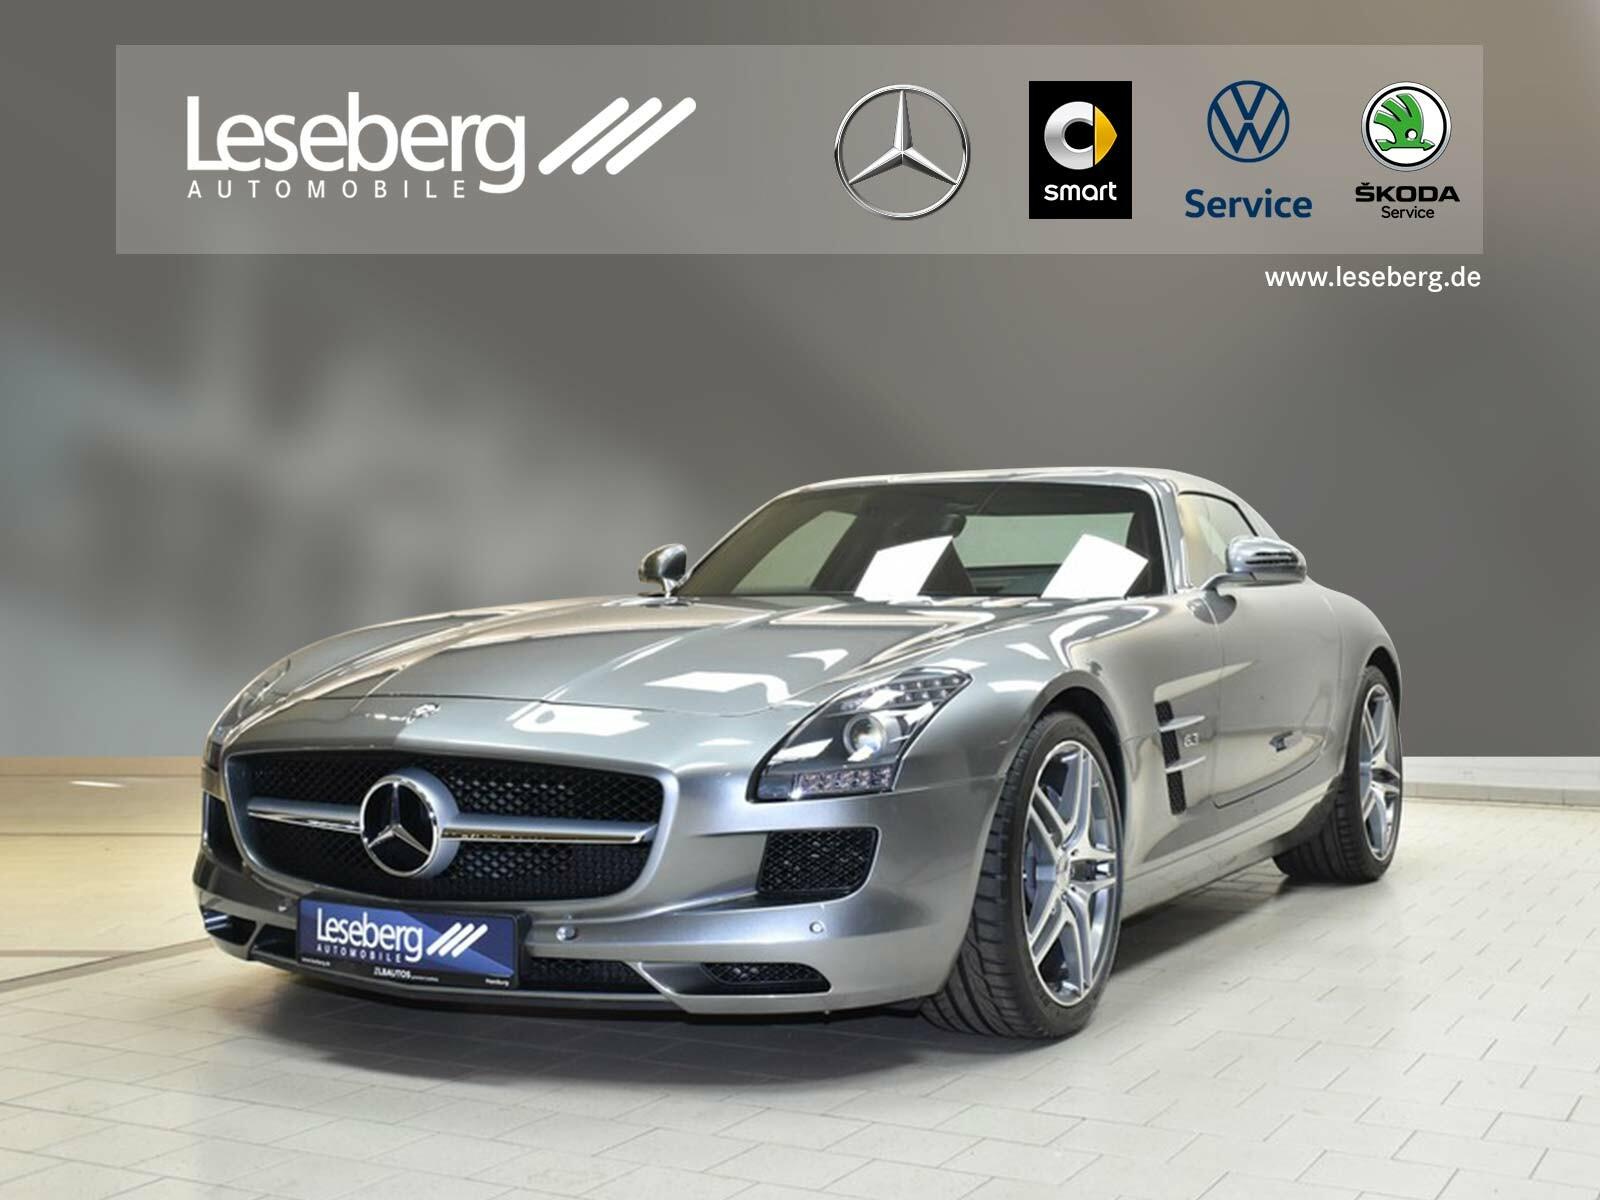 Mercedes-Benz SLS AMG Coupé Kamera/Memory/COMAND/Xenon/7G DCT, Jahr 2014, Benzin